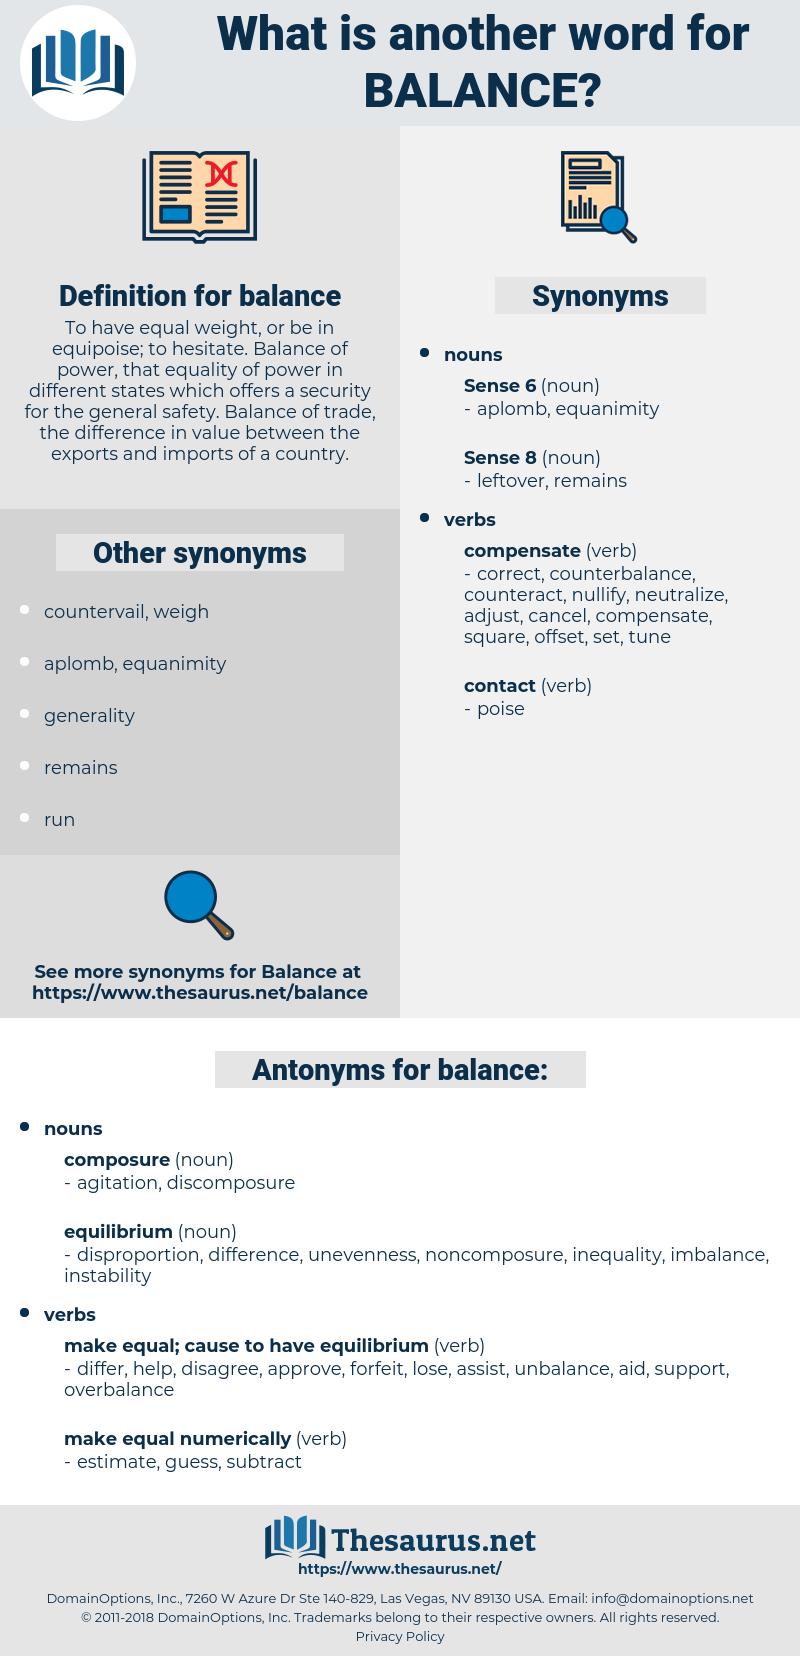 balance, synonym balance, another word for balance, words like balance, thesaurus balance